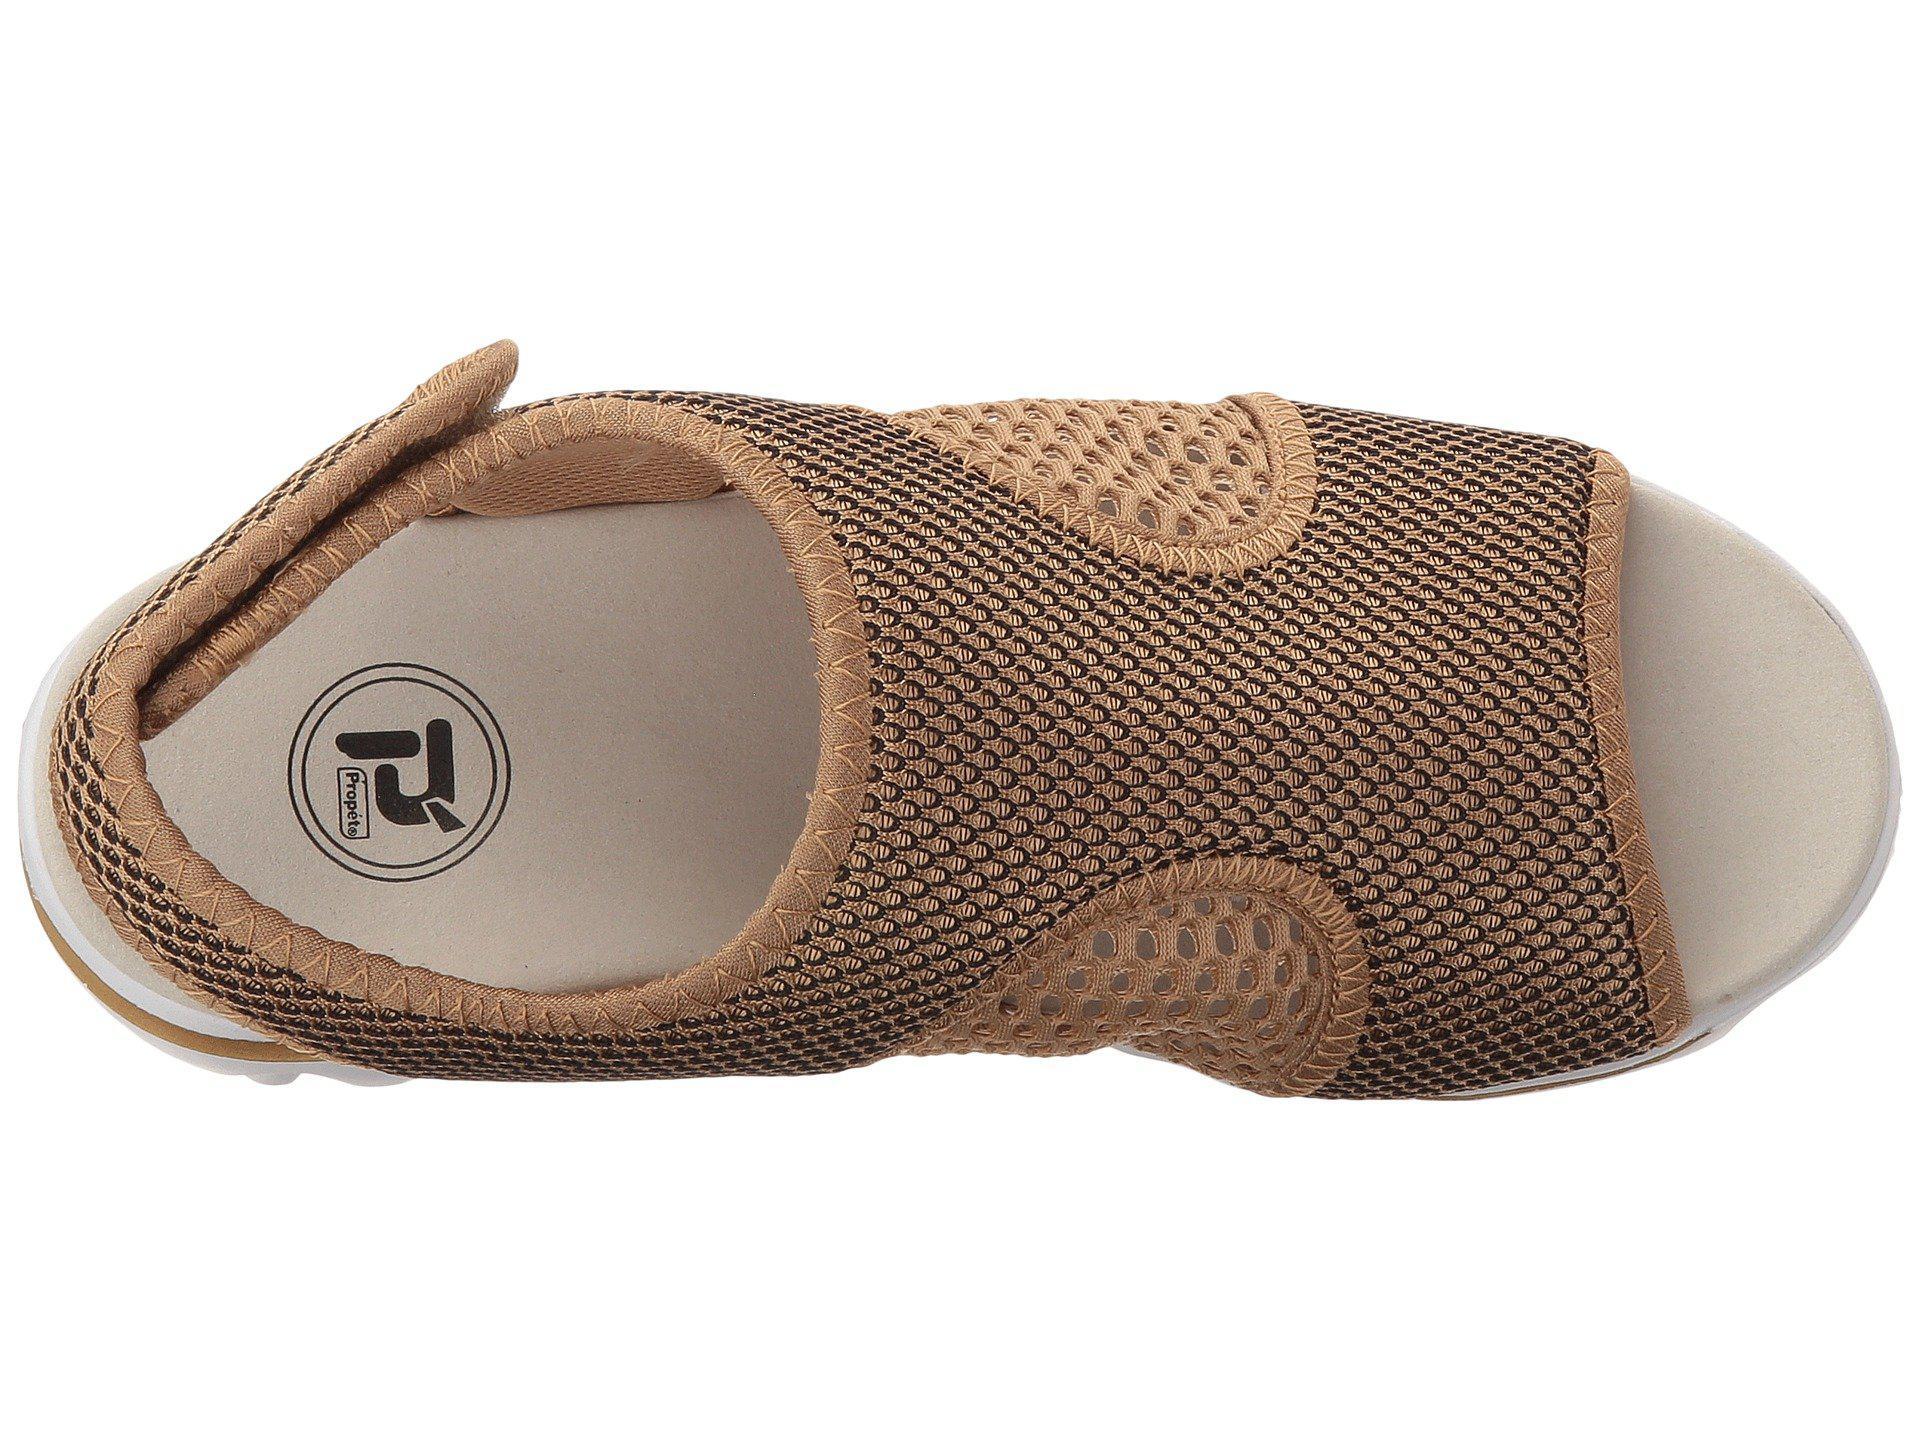 3f8c42150e1 Lyst - Propet Travelactiv Ss (silver black) Women s Sandals in Metallic